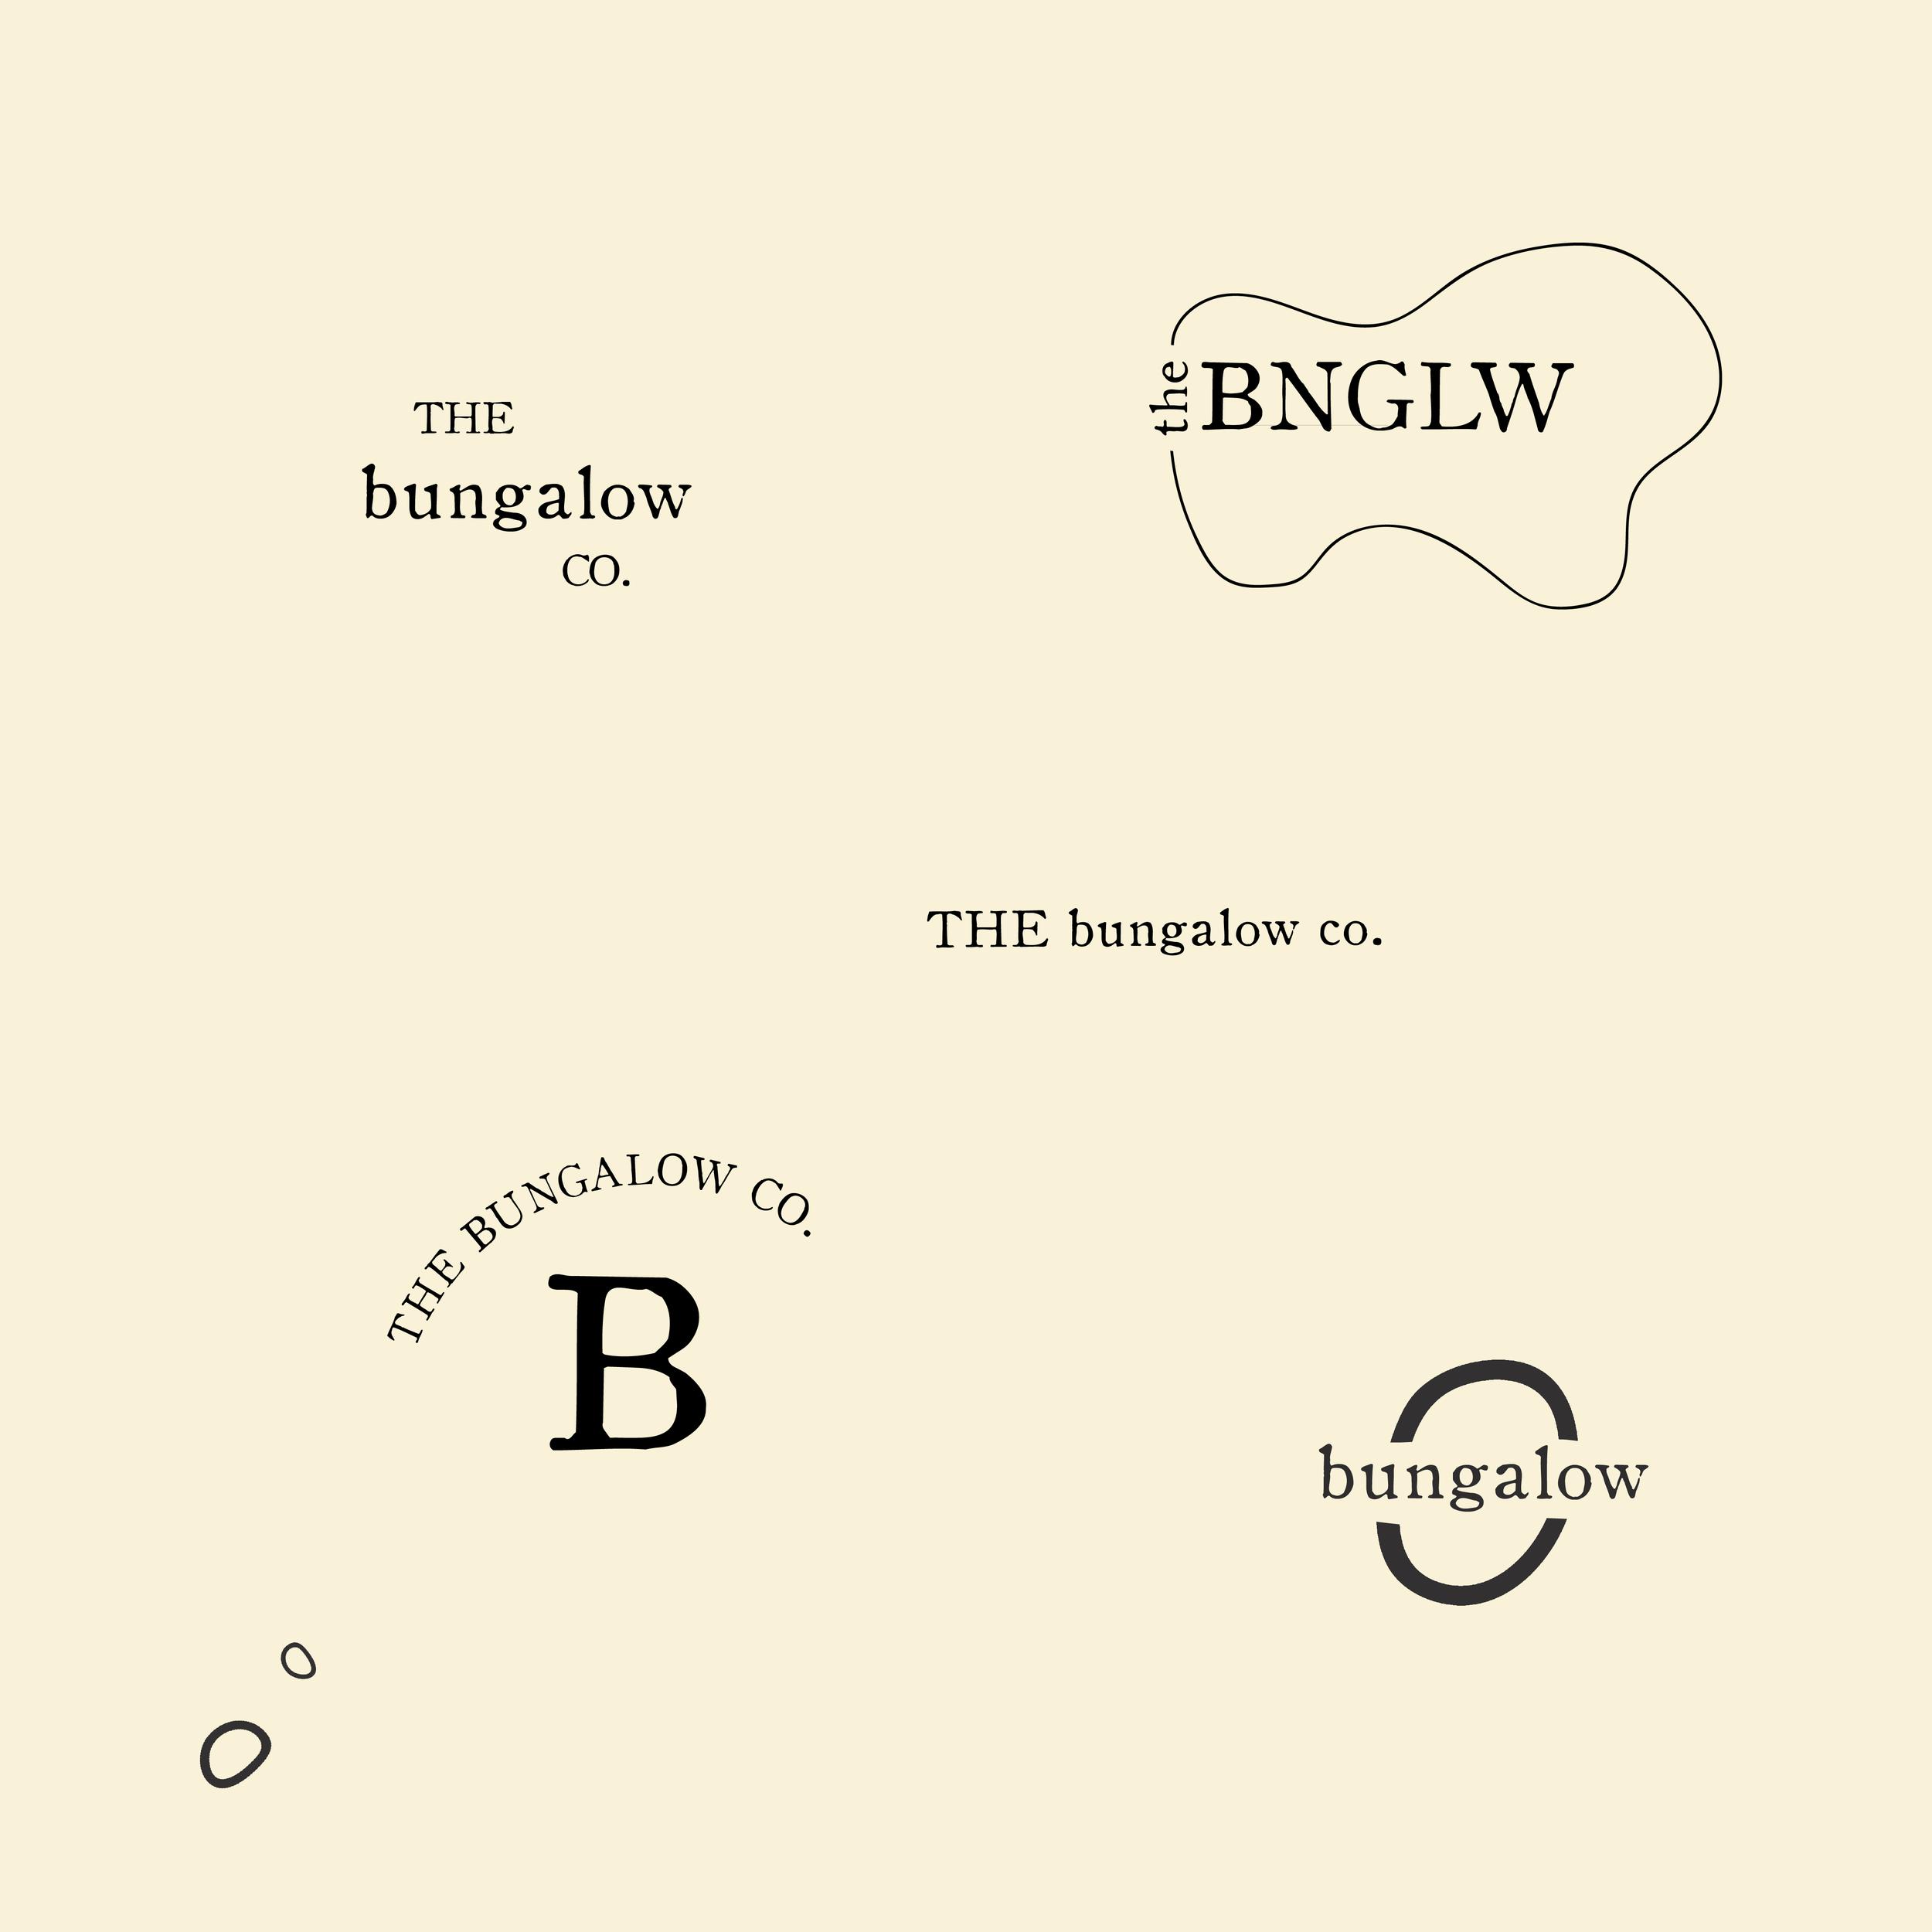 bungalow.png